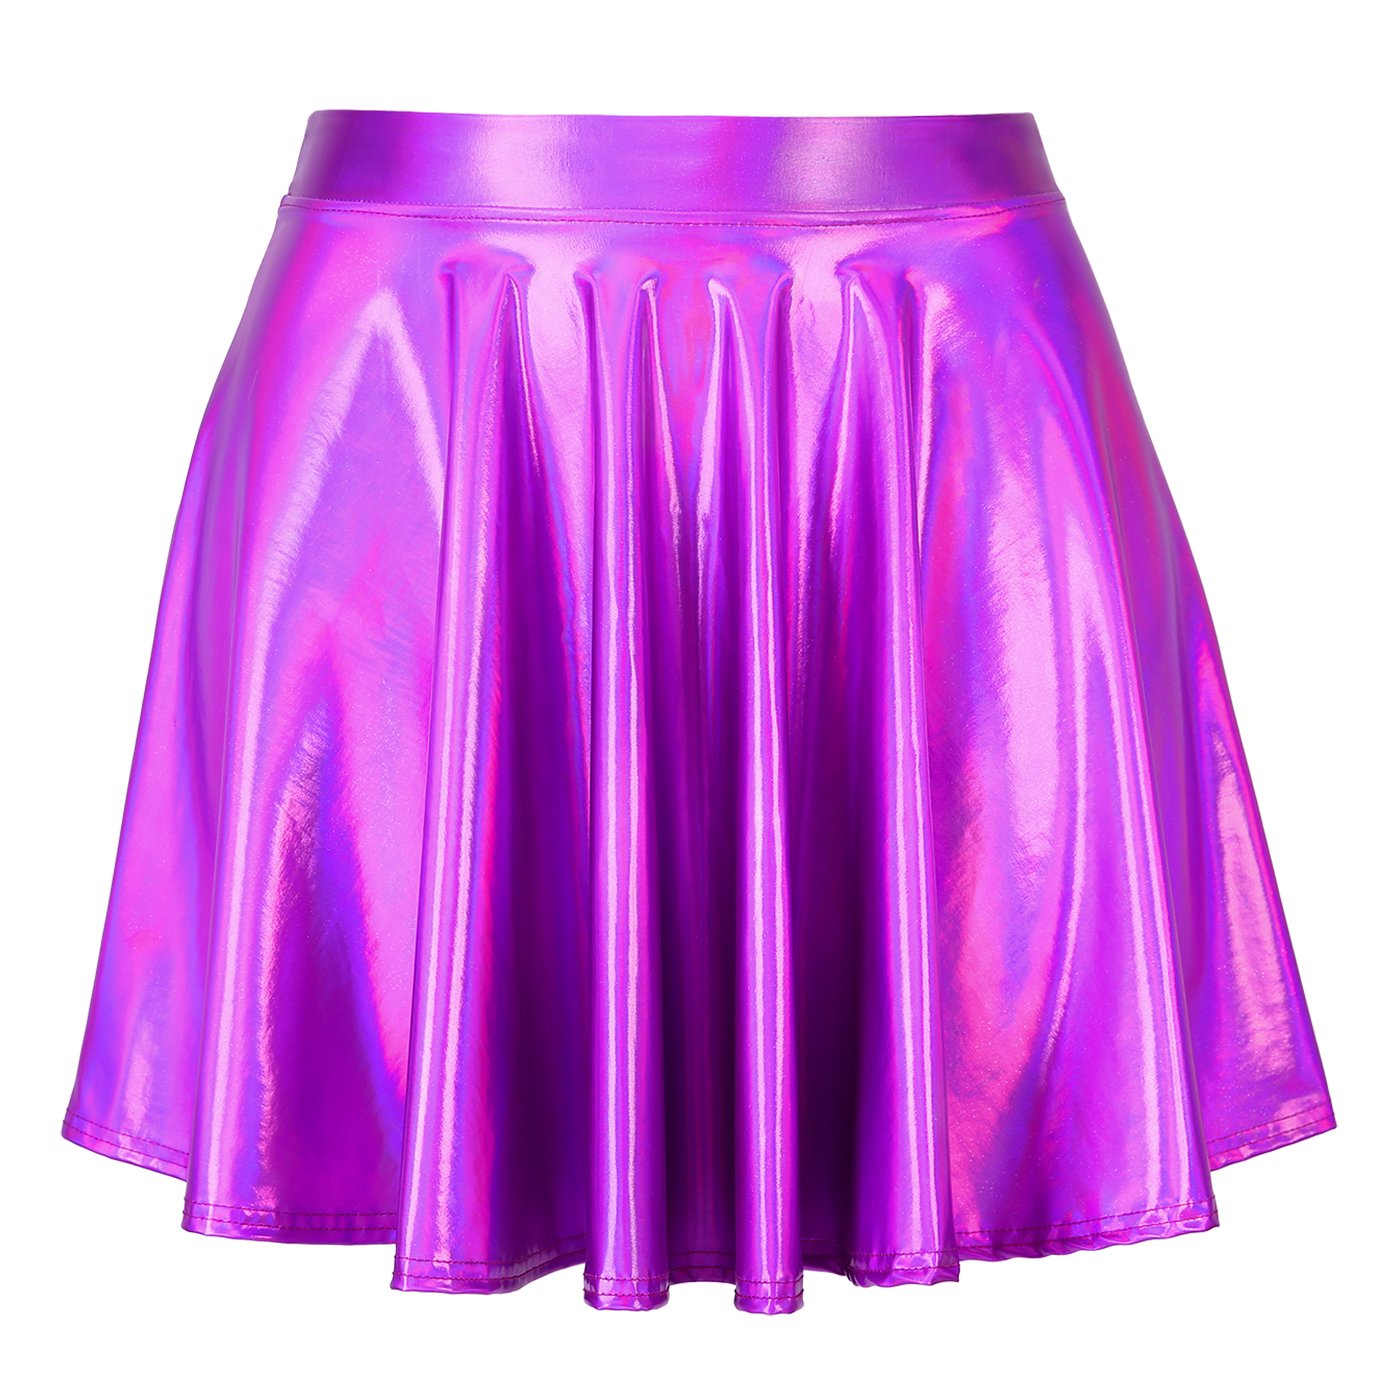 a2acb0d587e HDE Women s Shiny Liquid Metallic Holographic Pleated Flared Mini Skater  Skirt (Fuchsia